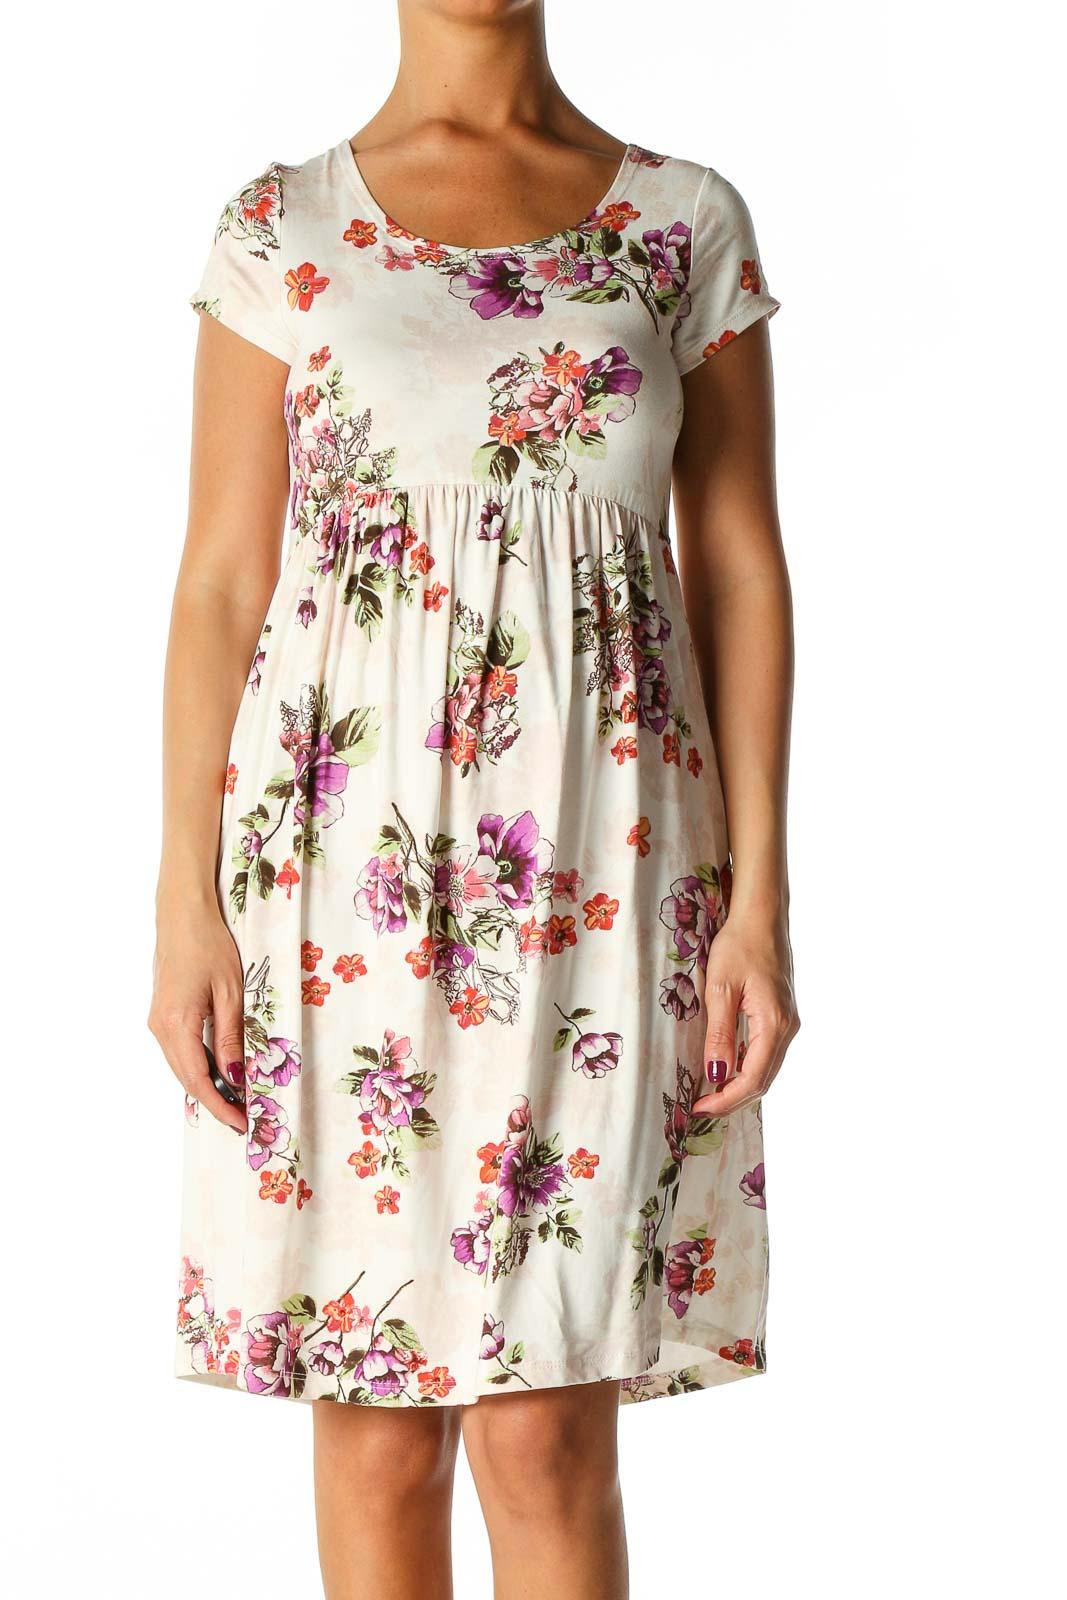 Beige Floral Print Casual A-Line Dress Front